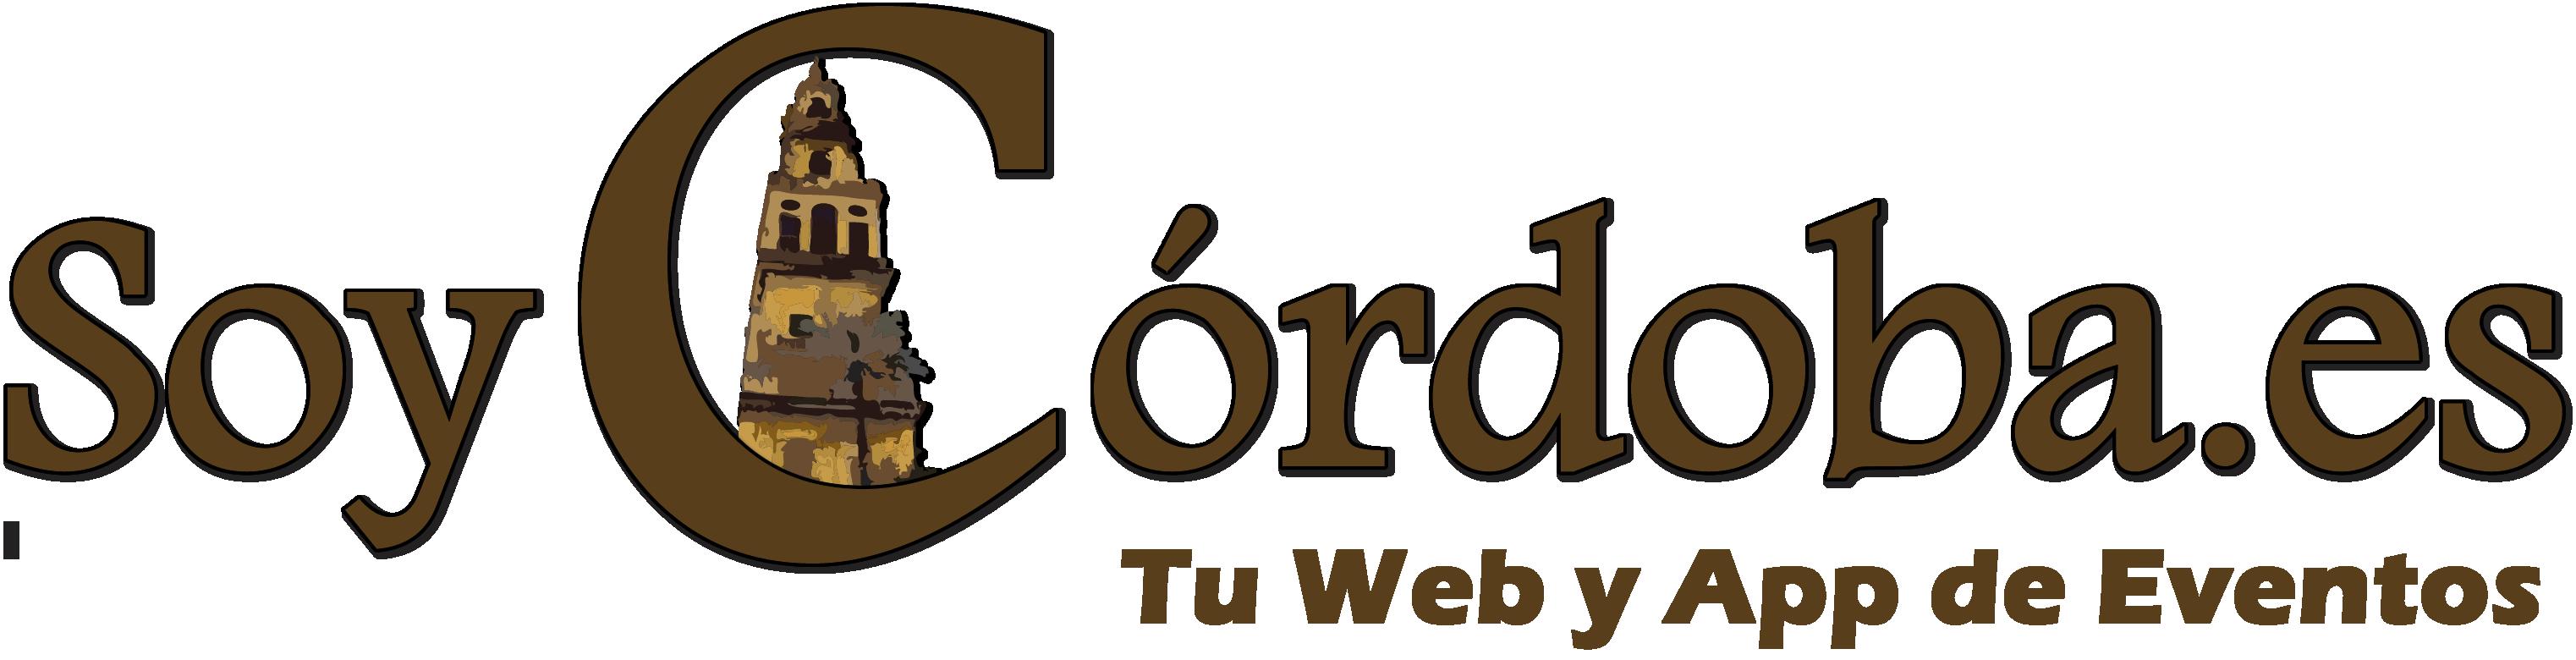 https://www.truecalia.com/media/img/logosoycordobaplano.png